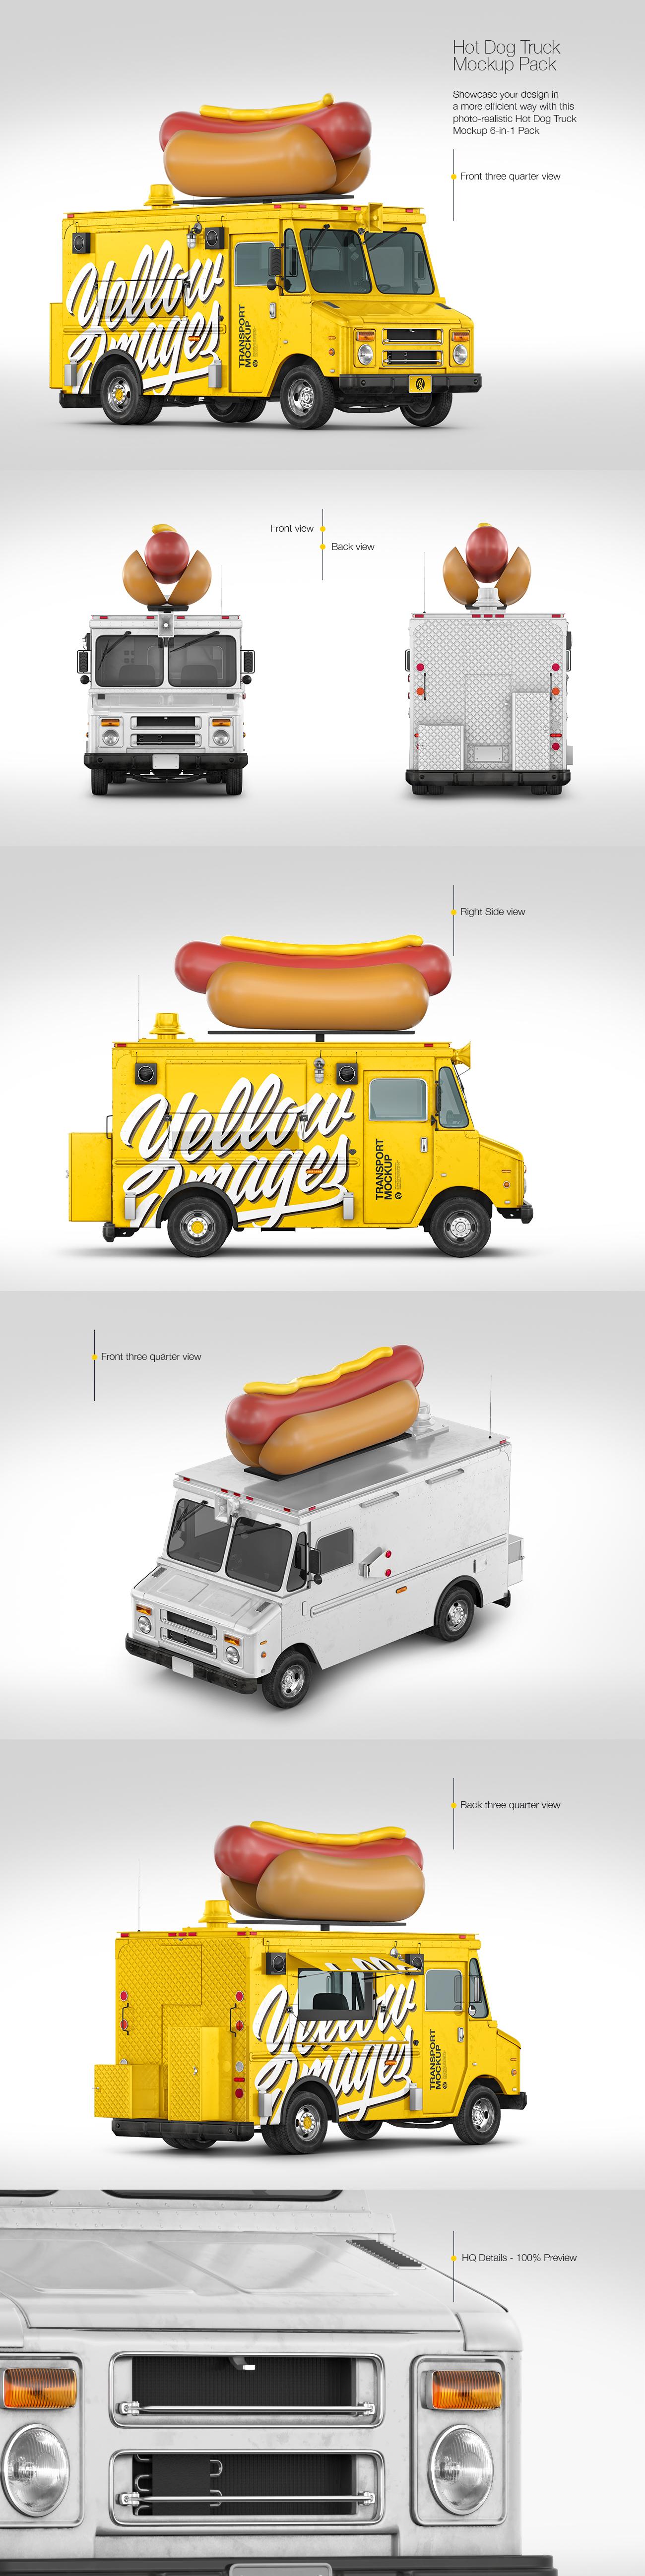 Hot Dog Truck Mockup Pack